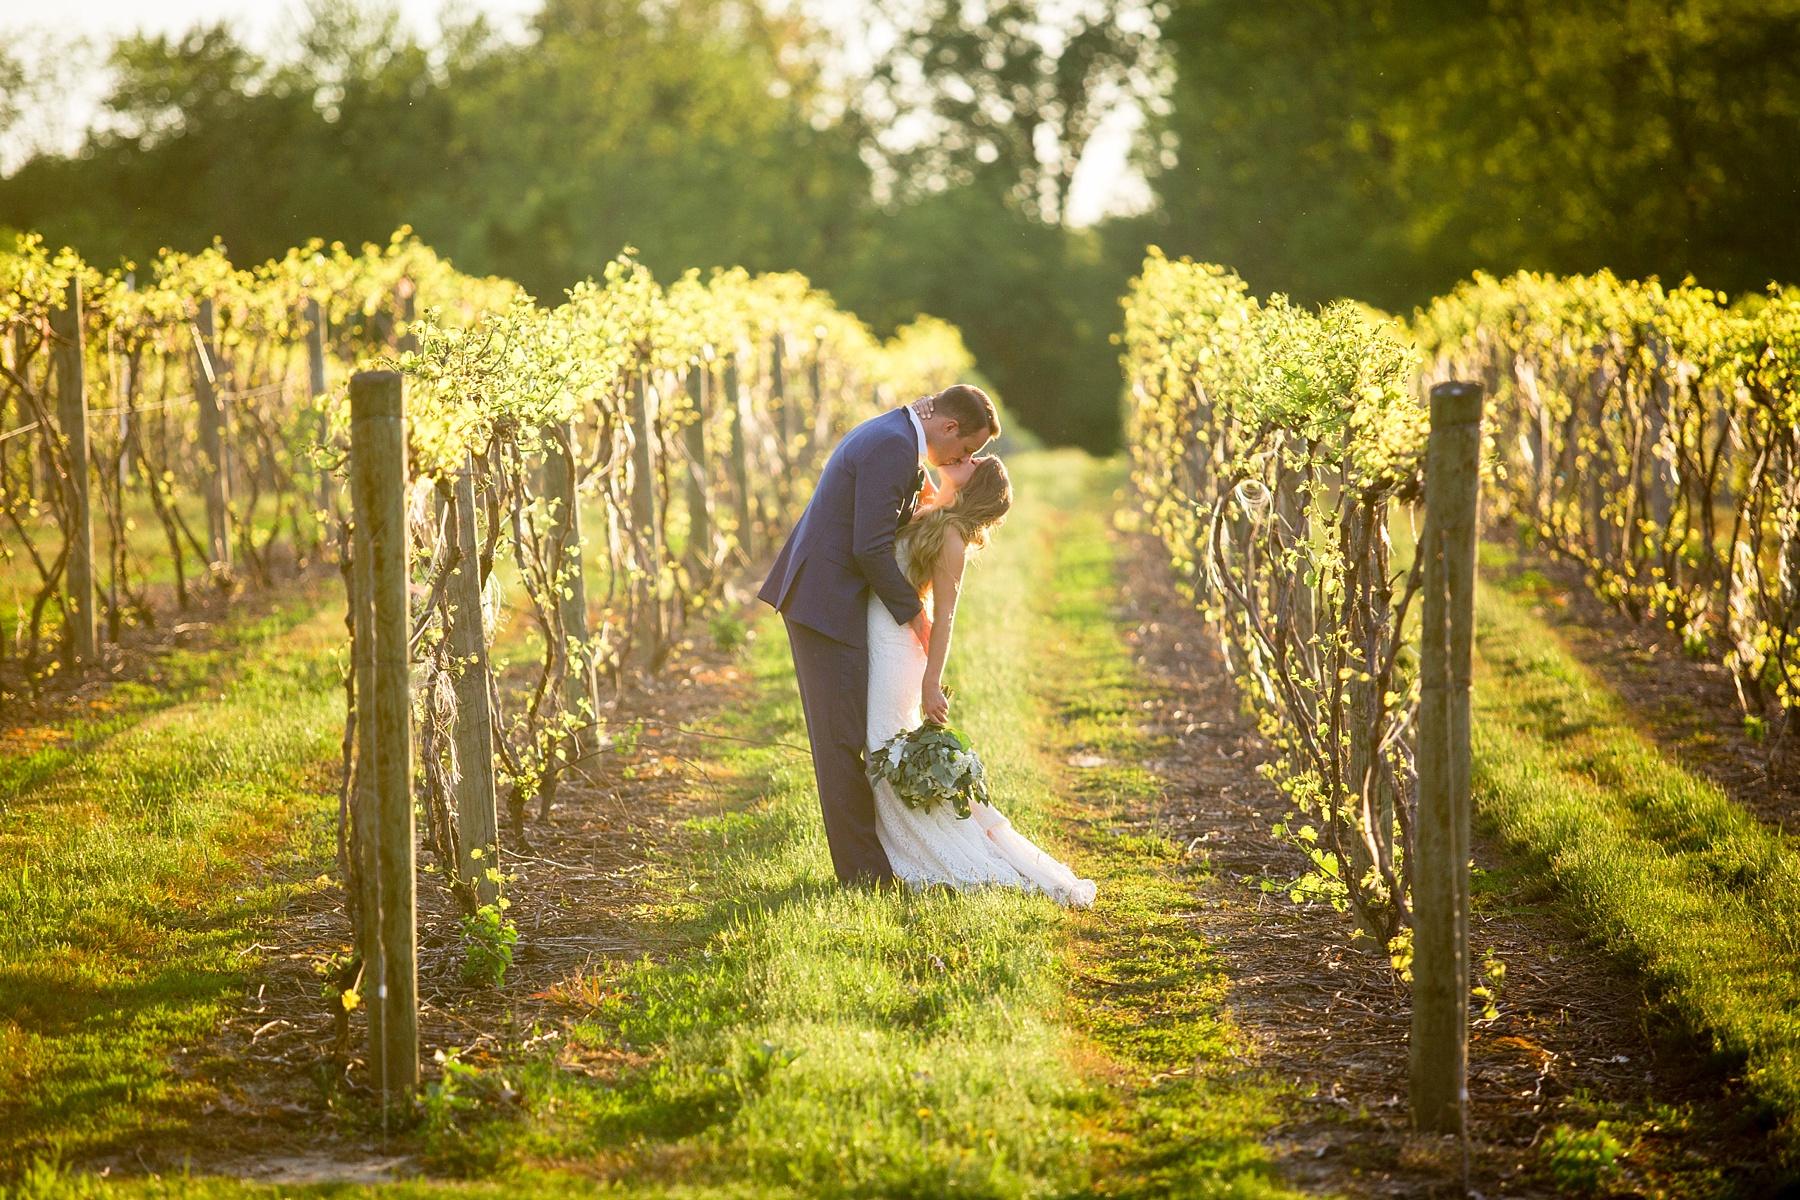 Brandon_Shafer_Photography_Kara_Doug_12_corners_Wedding_Benton_Harbor_0082.jpg